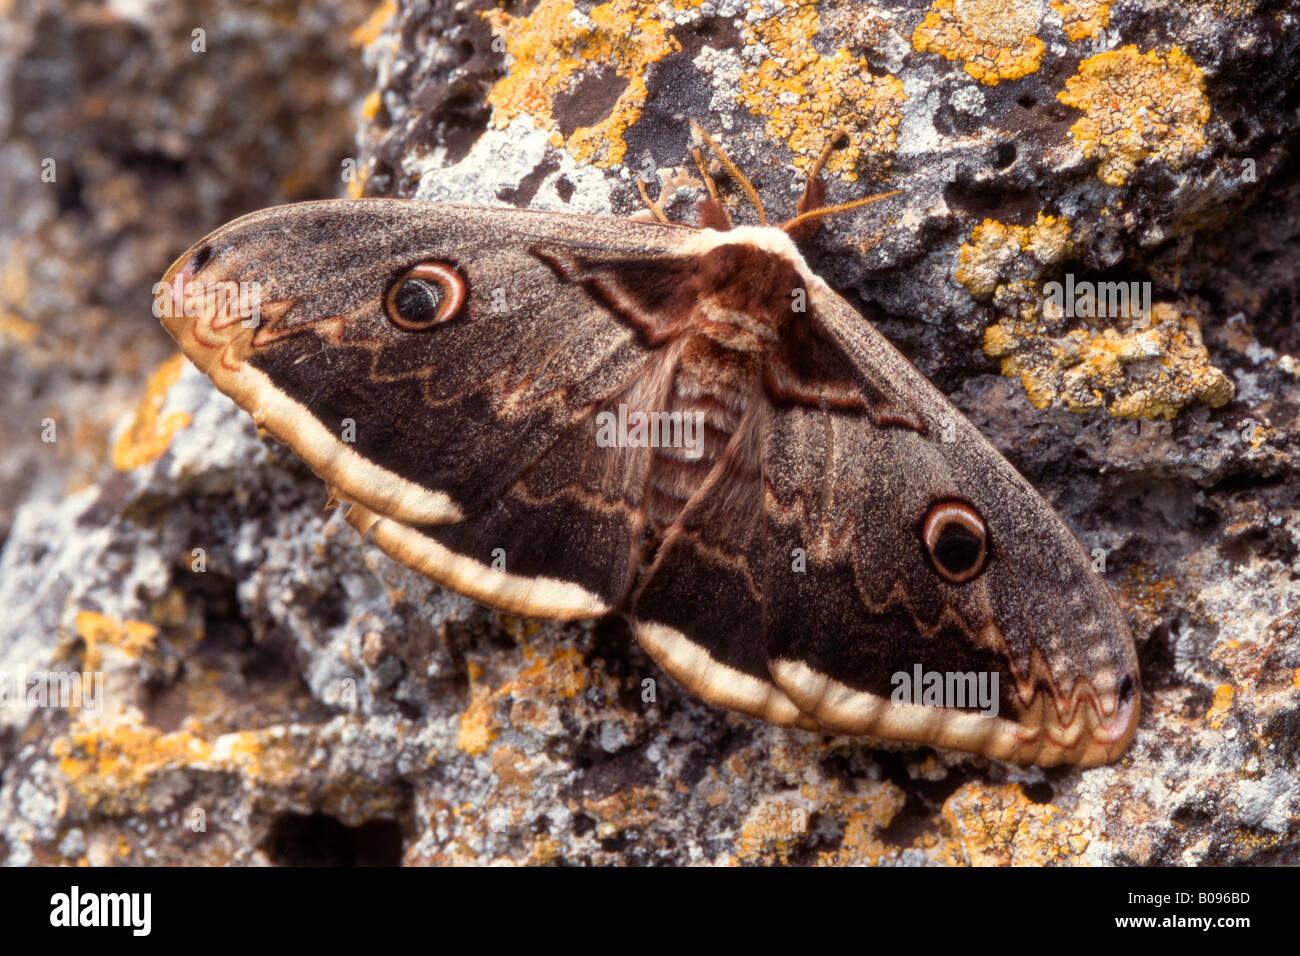 Giant Peacock Moth or Great Emperor Moth (Saturnia pyri) Stock Photo